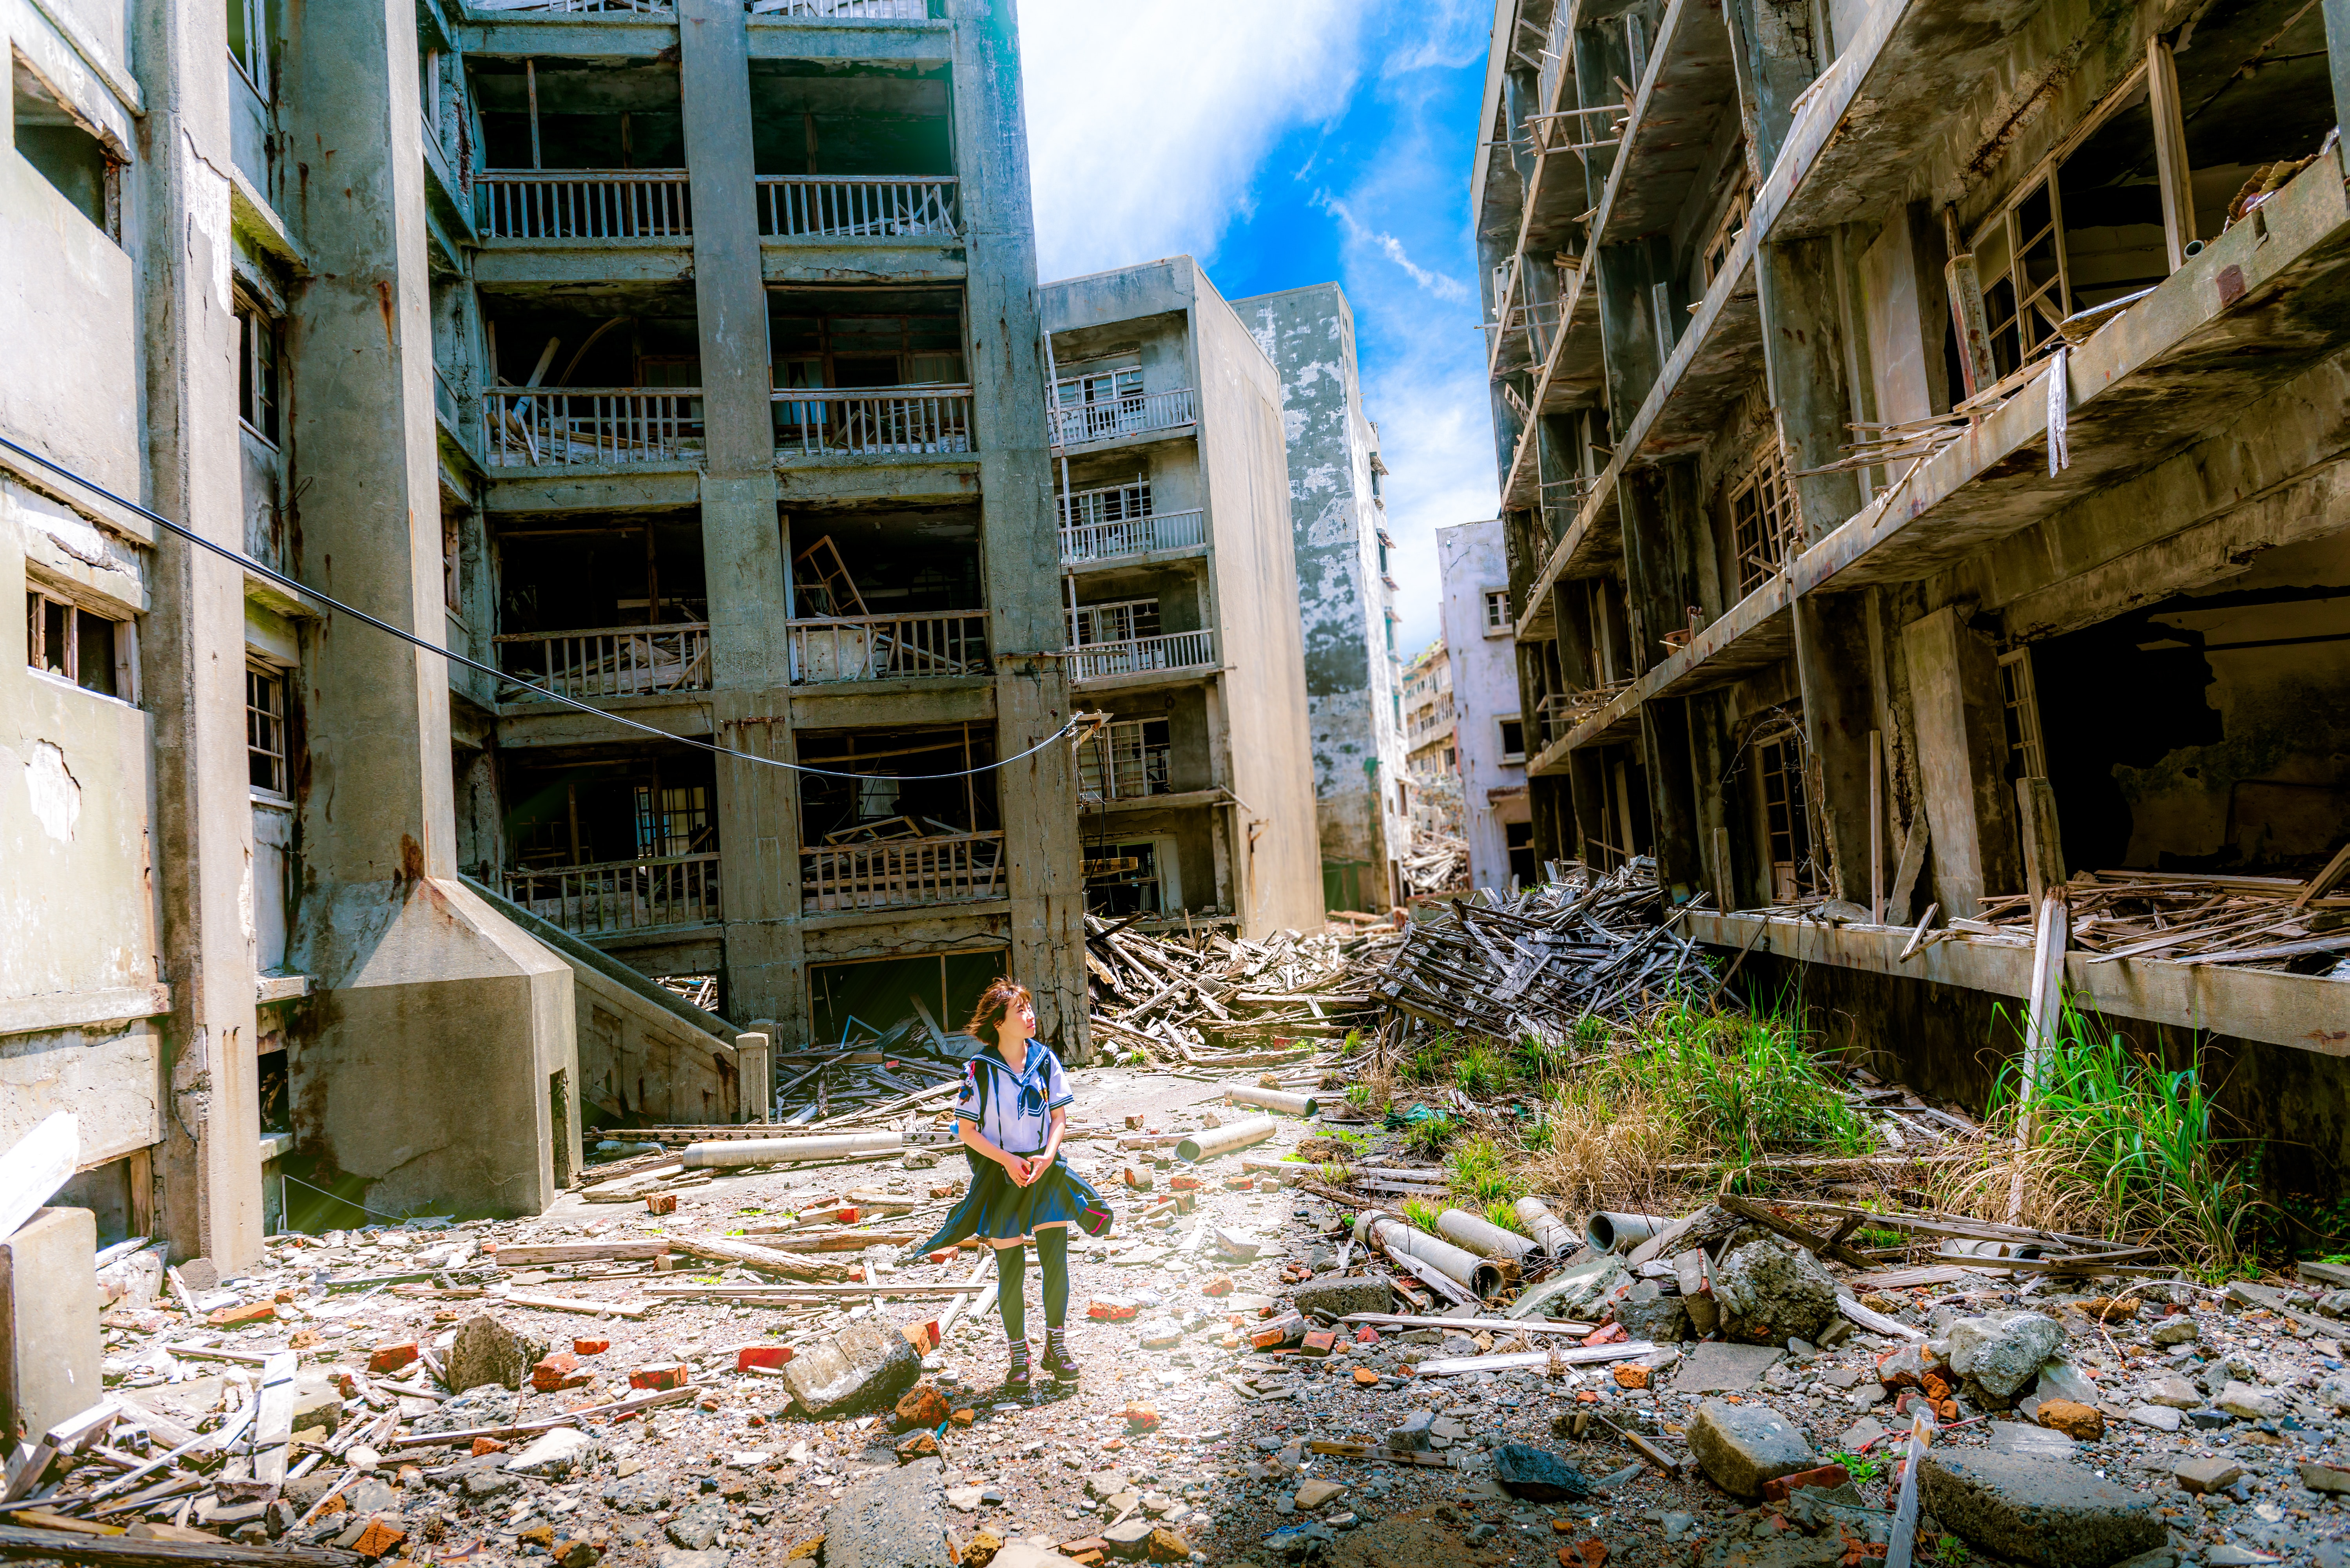 barn krig ruiner